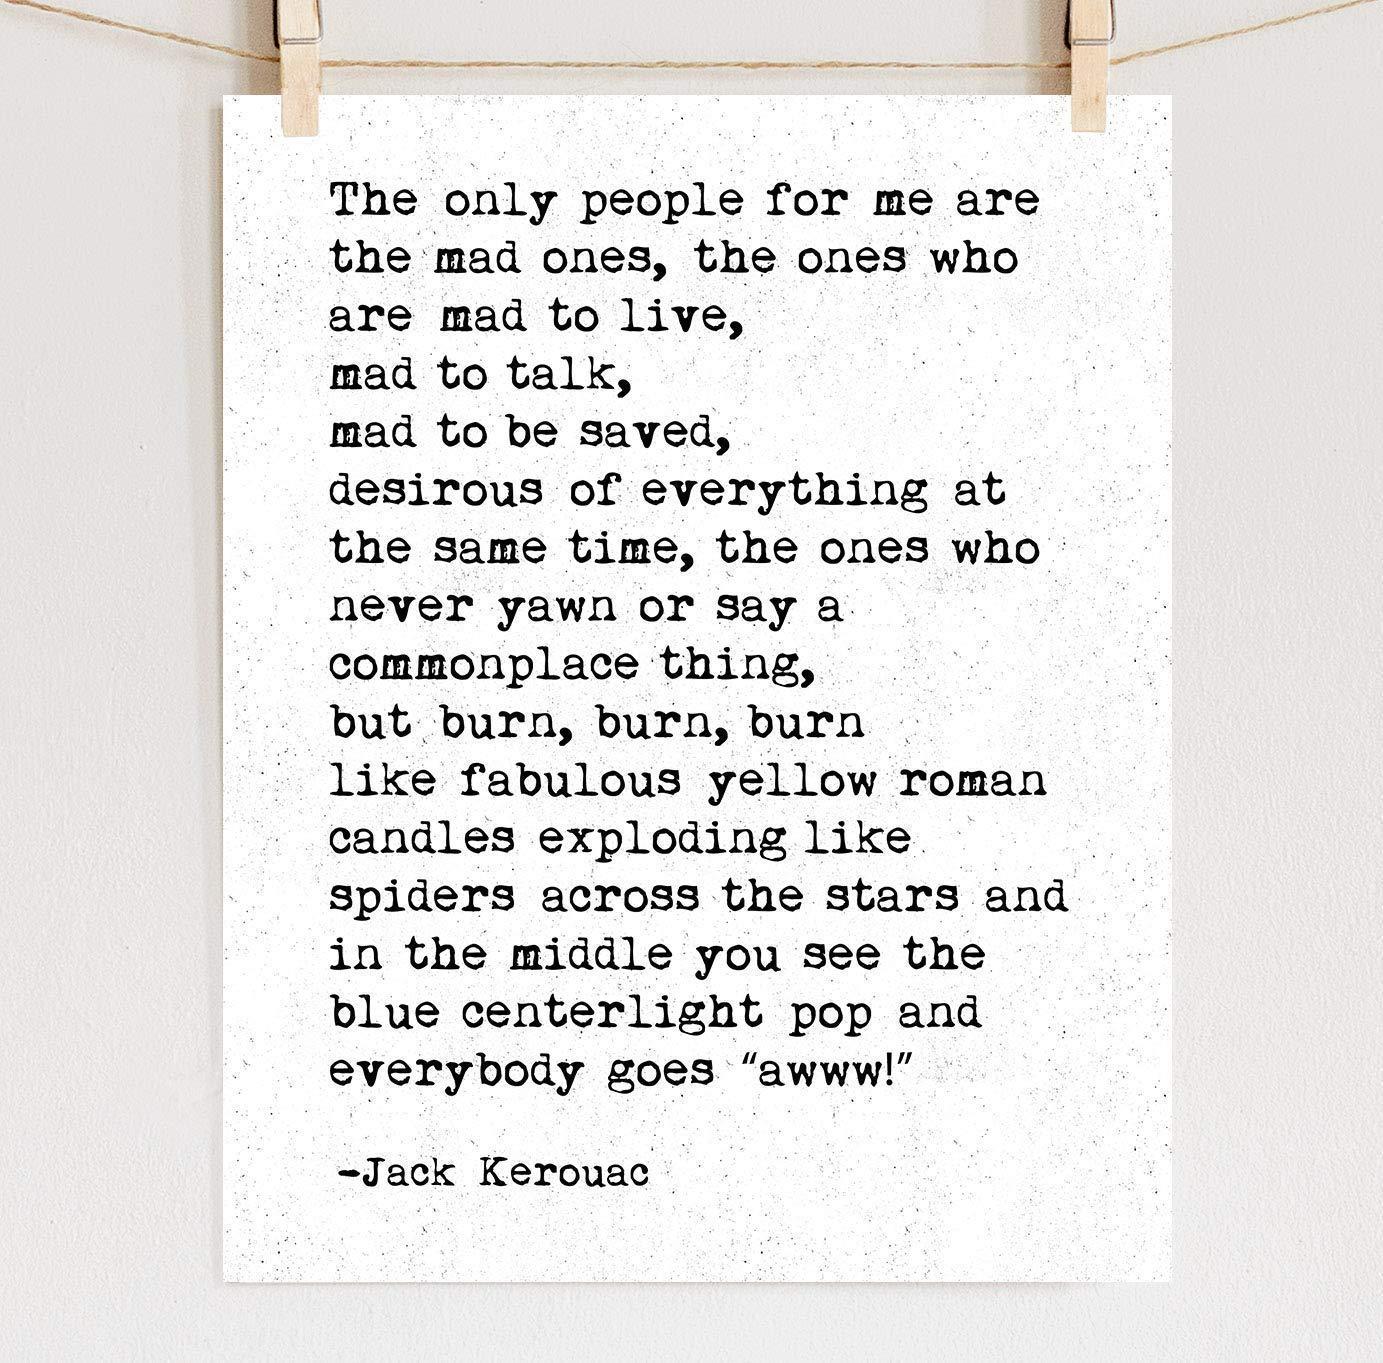 Jack Kerouac Quotes - - StoreMyPic